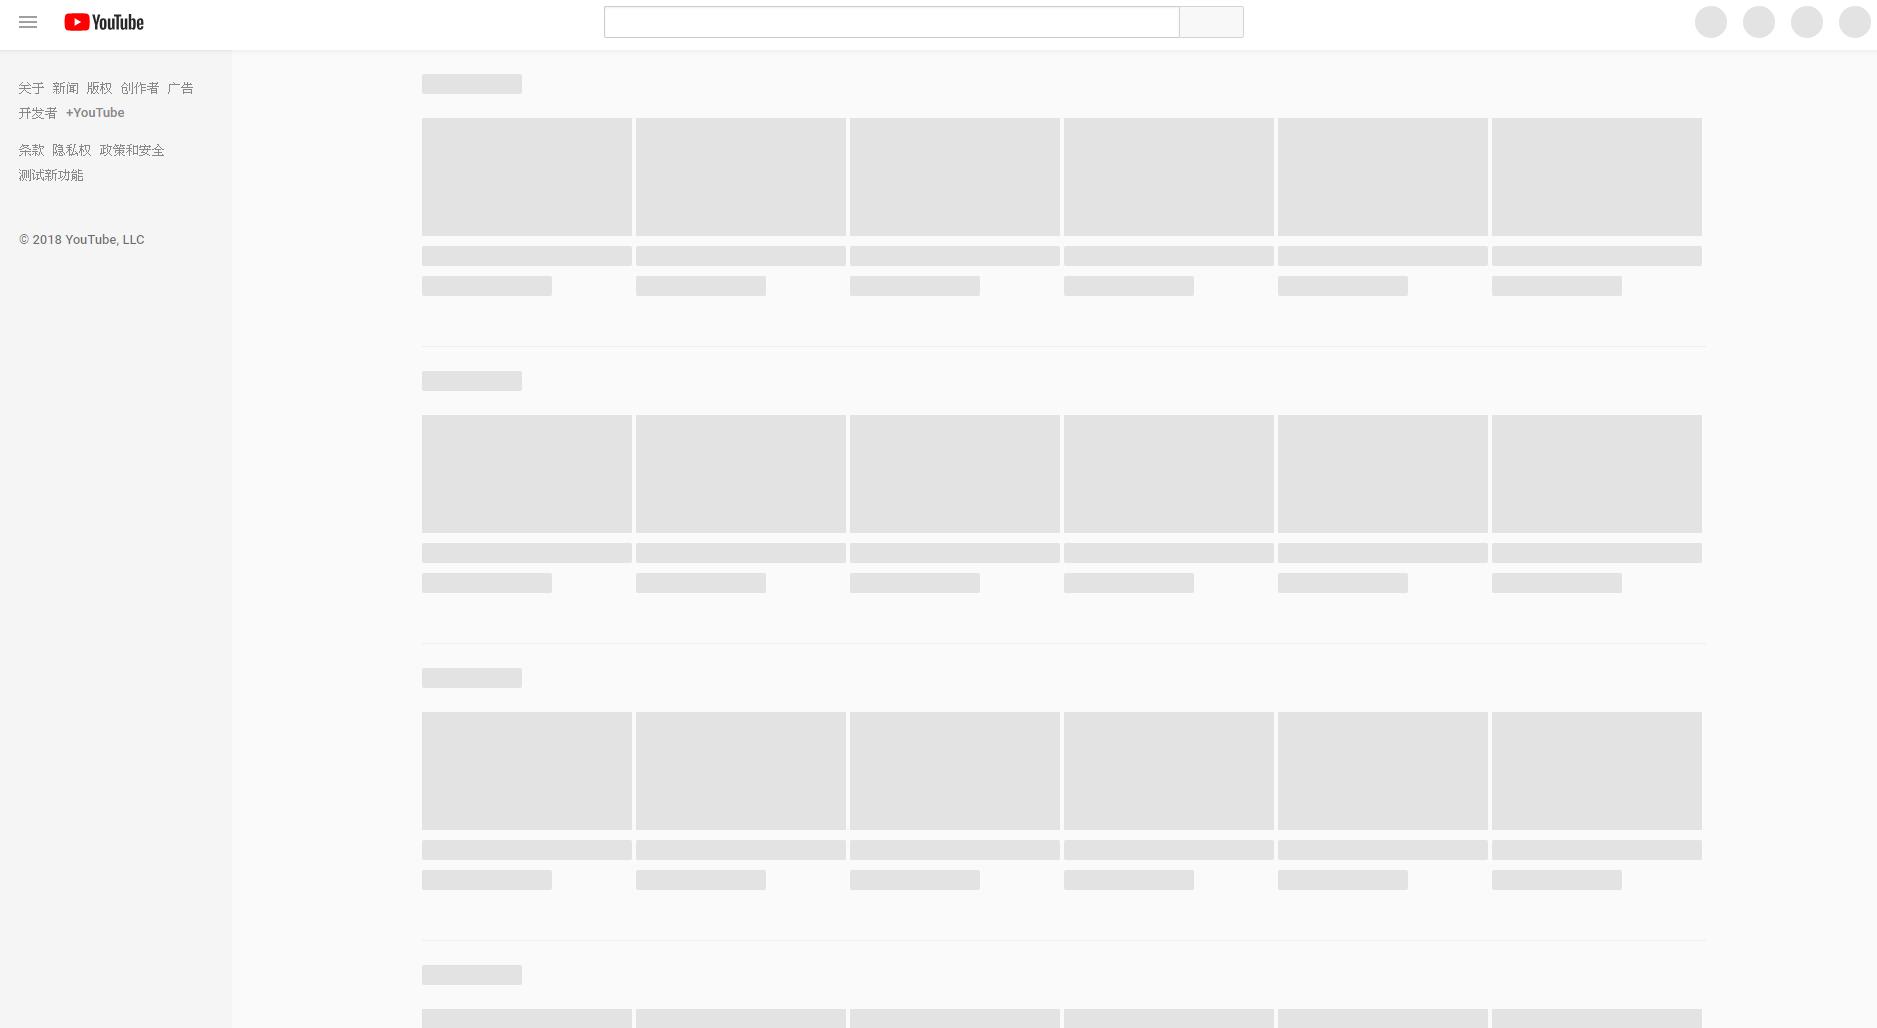 YouTube 挂了YouTube 官方确认此事但未给出原因